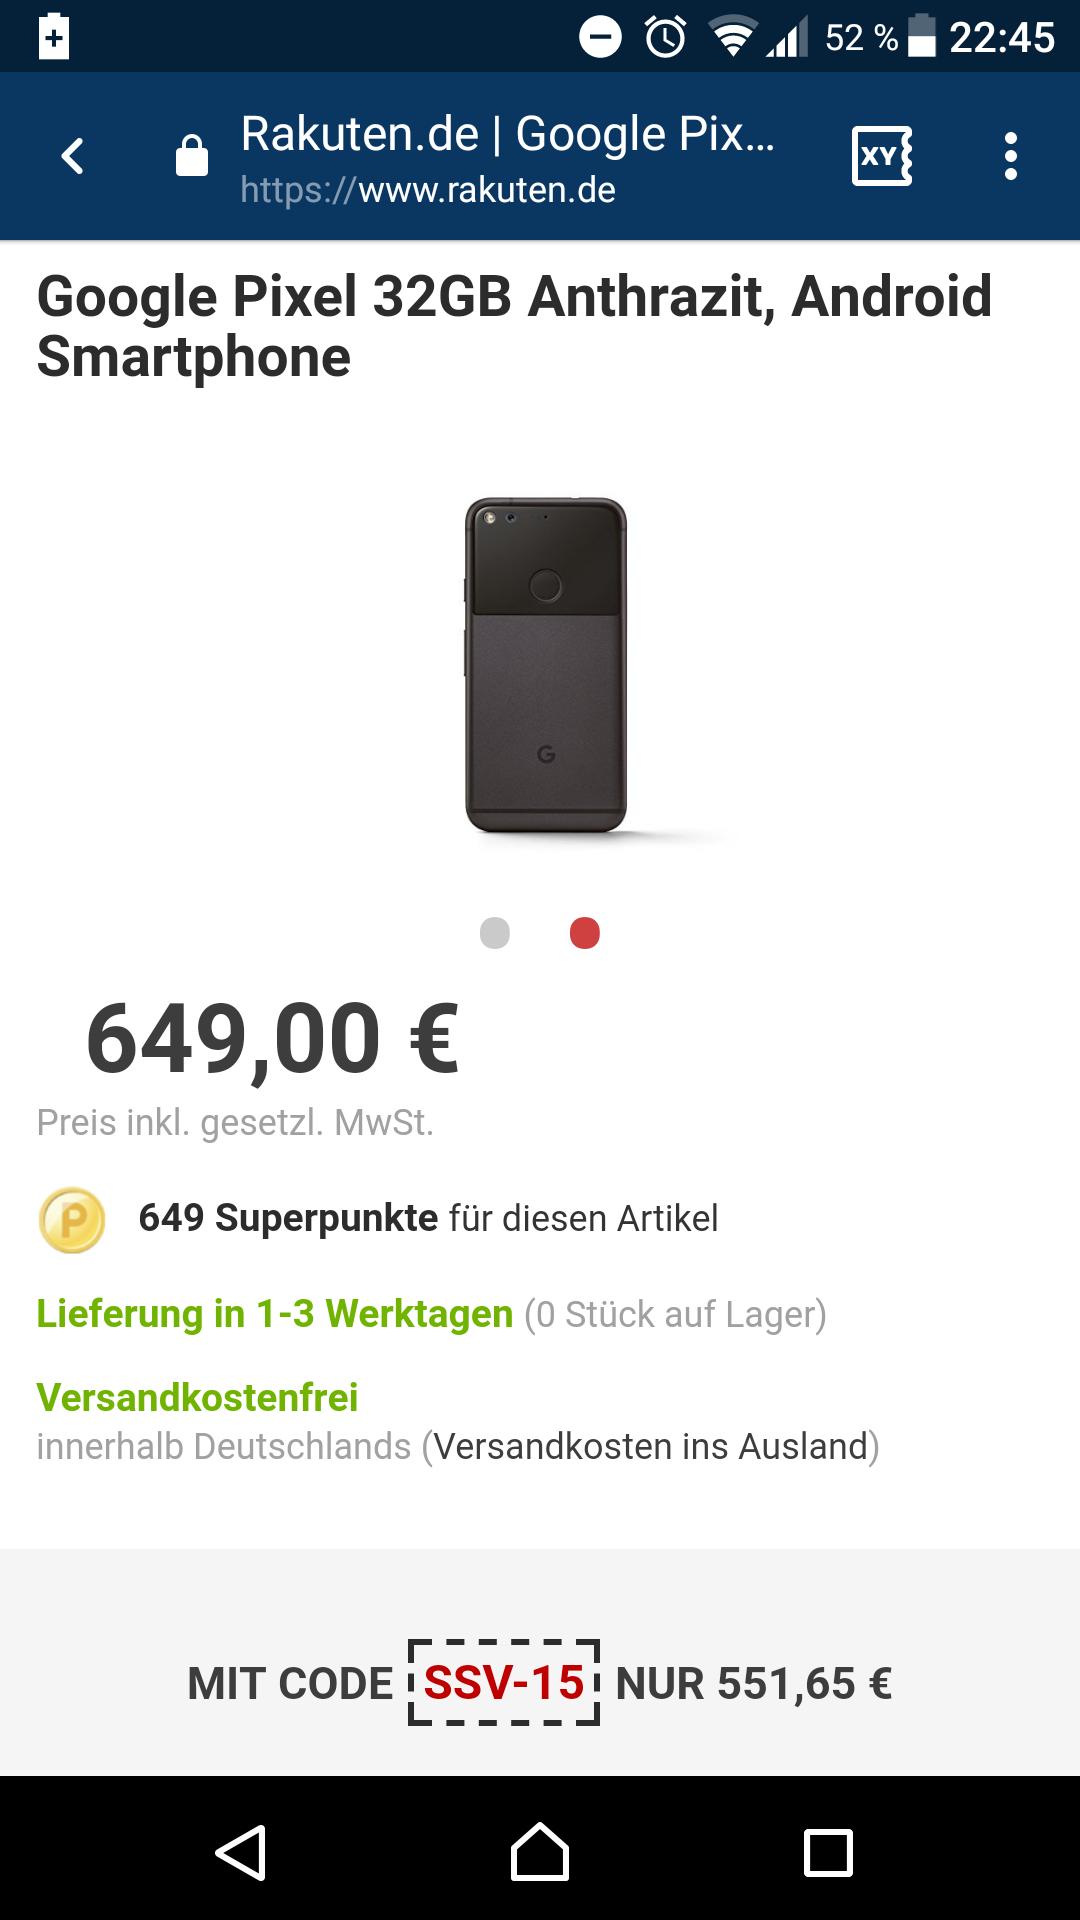 [Rakuten] Google Pixel 32GB Anthrazit